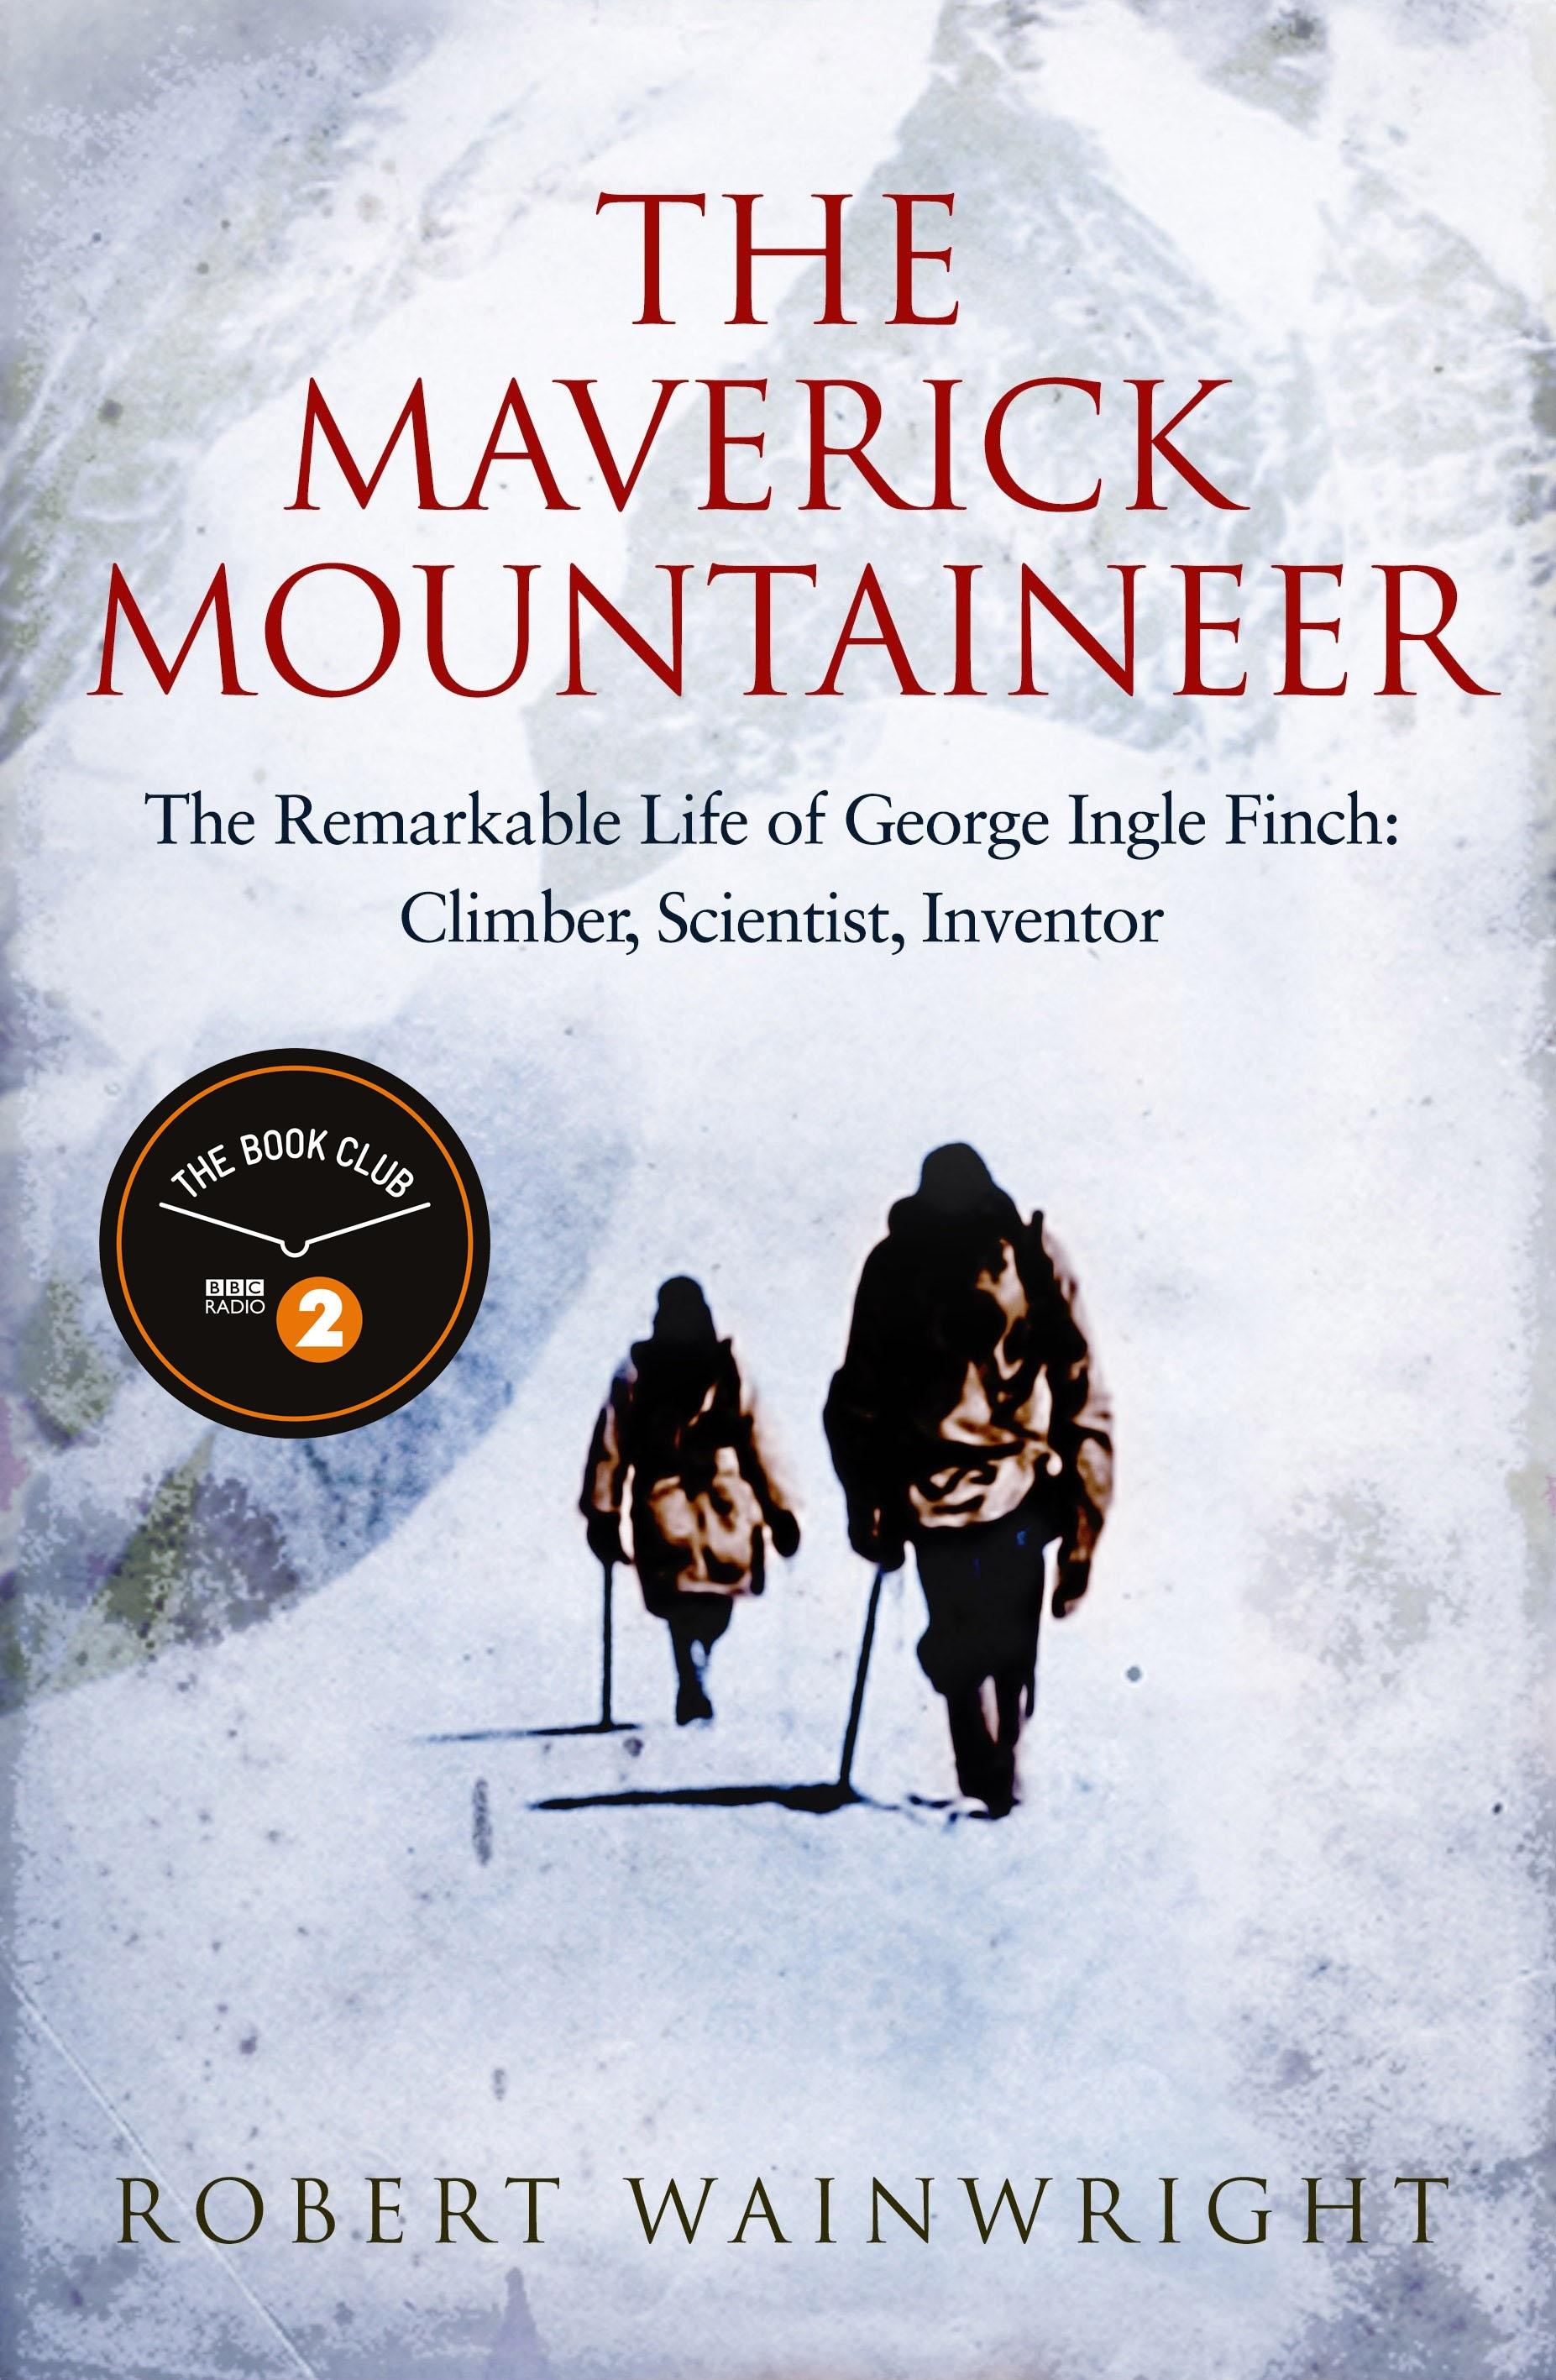 The Maverick Mountaineer.jpg